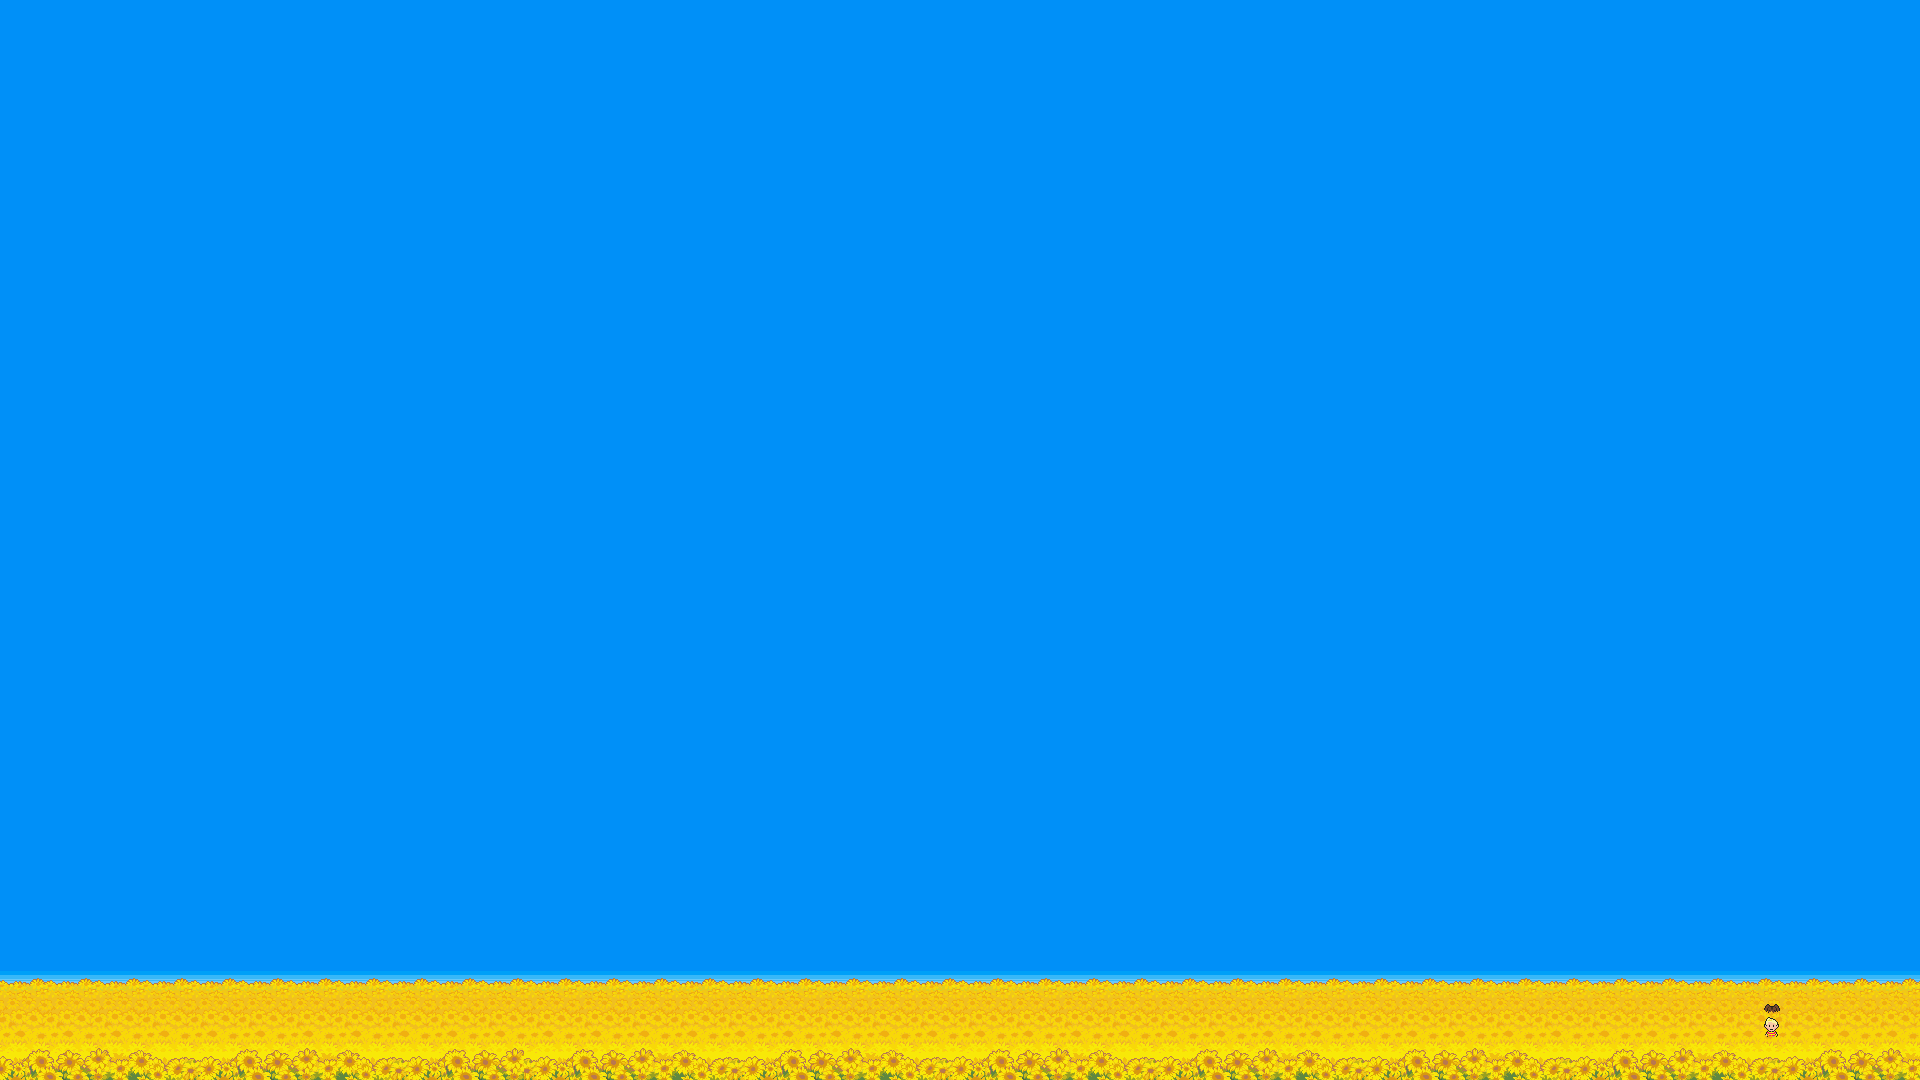 Earthbound Computer Wallpapers Desktop Backgrounds 1920x1080 ID 1920x1080